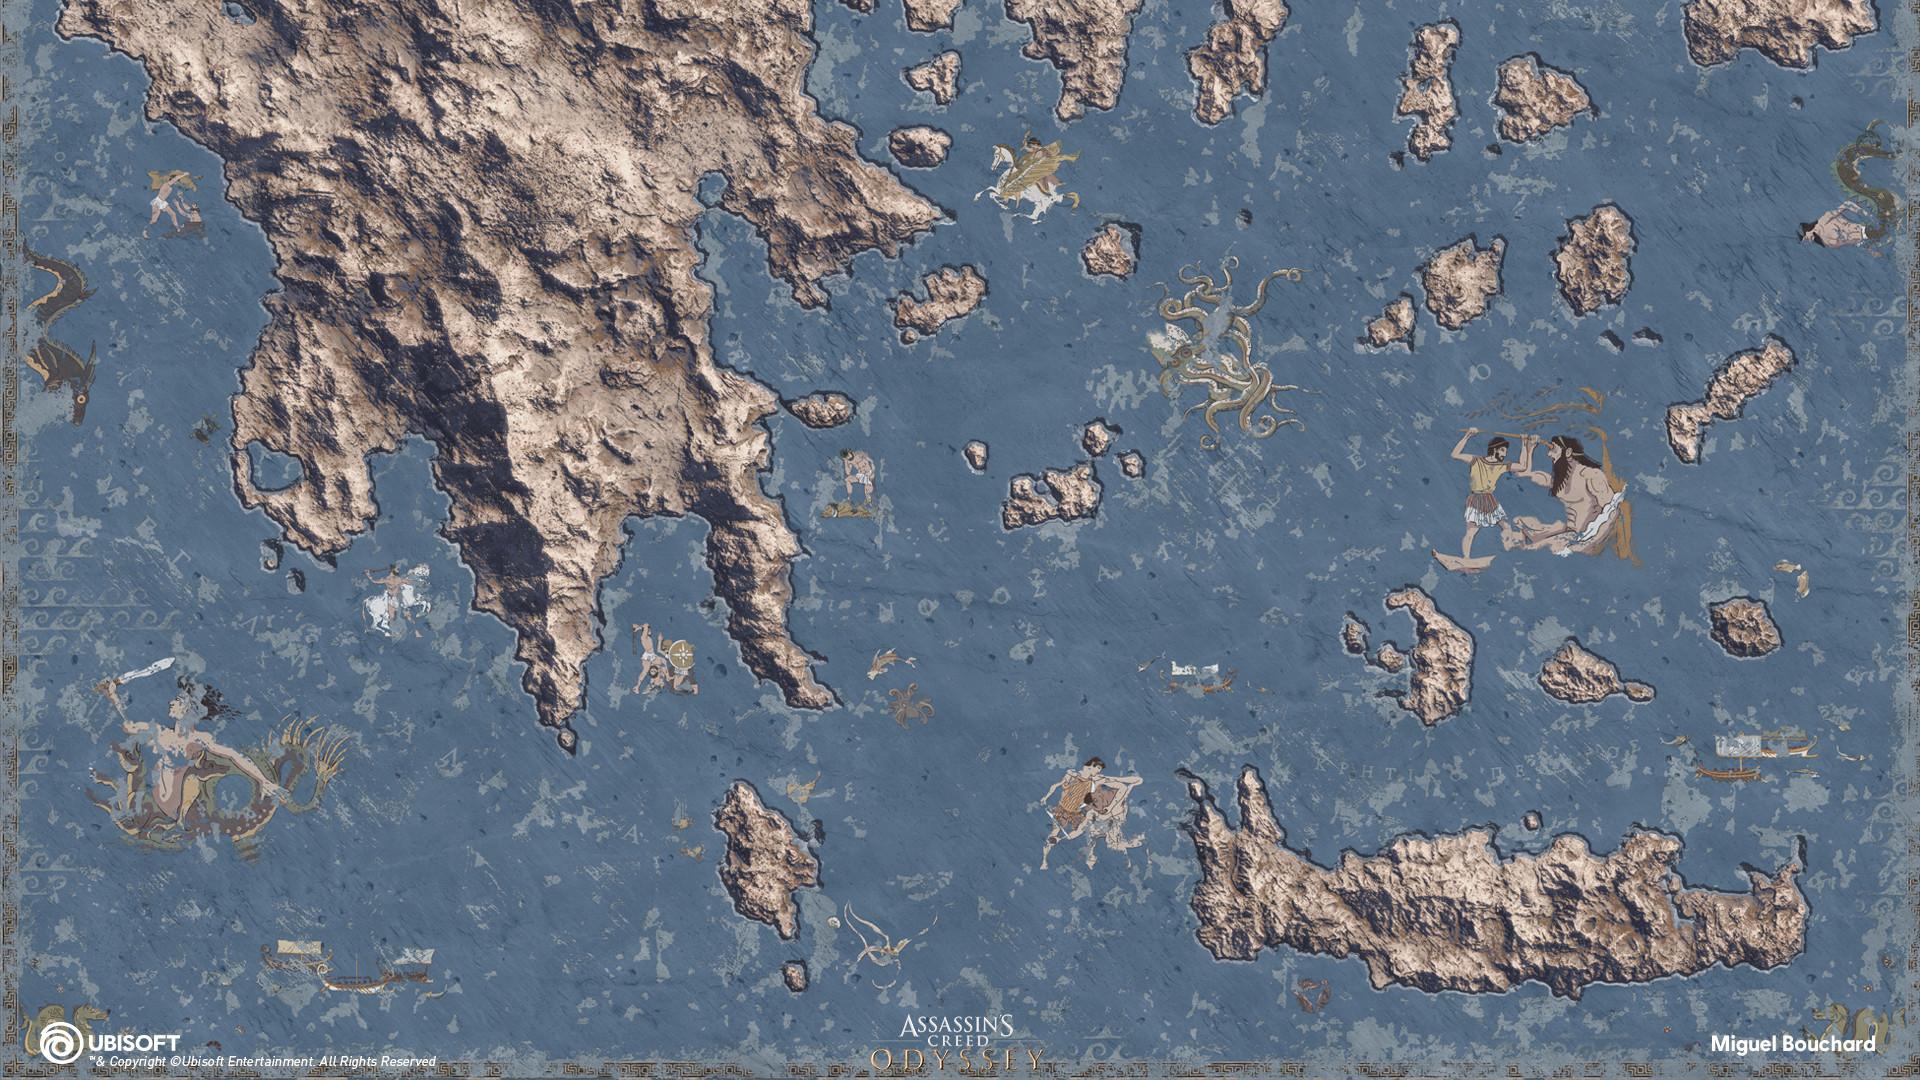 Artstation Fog Of War Map Assassin S Creed Odyssey Miguel Bouchard